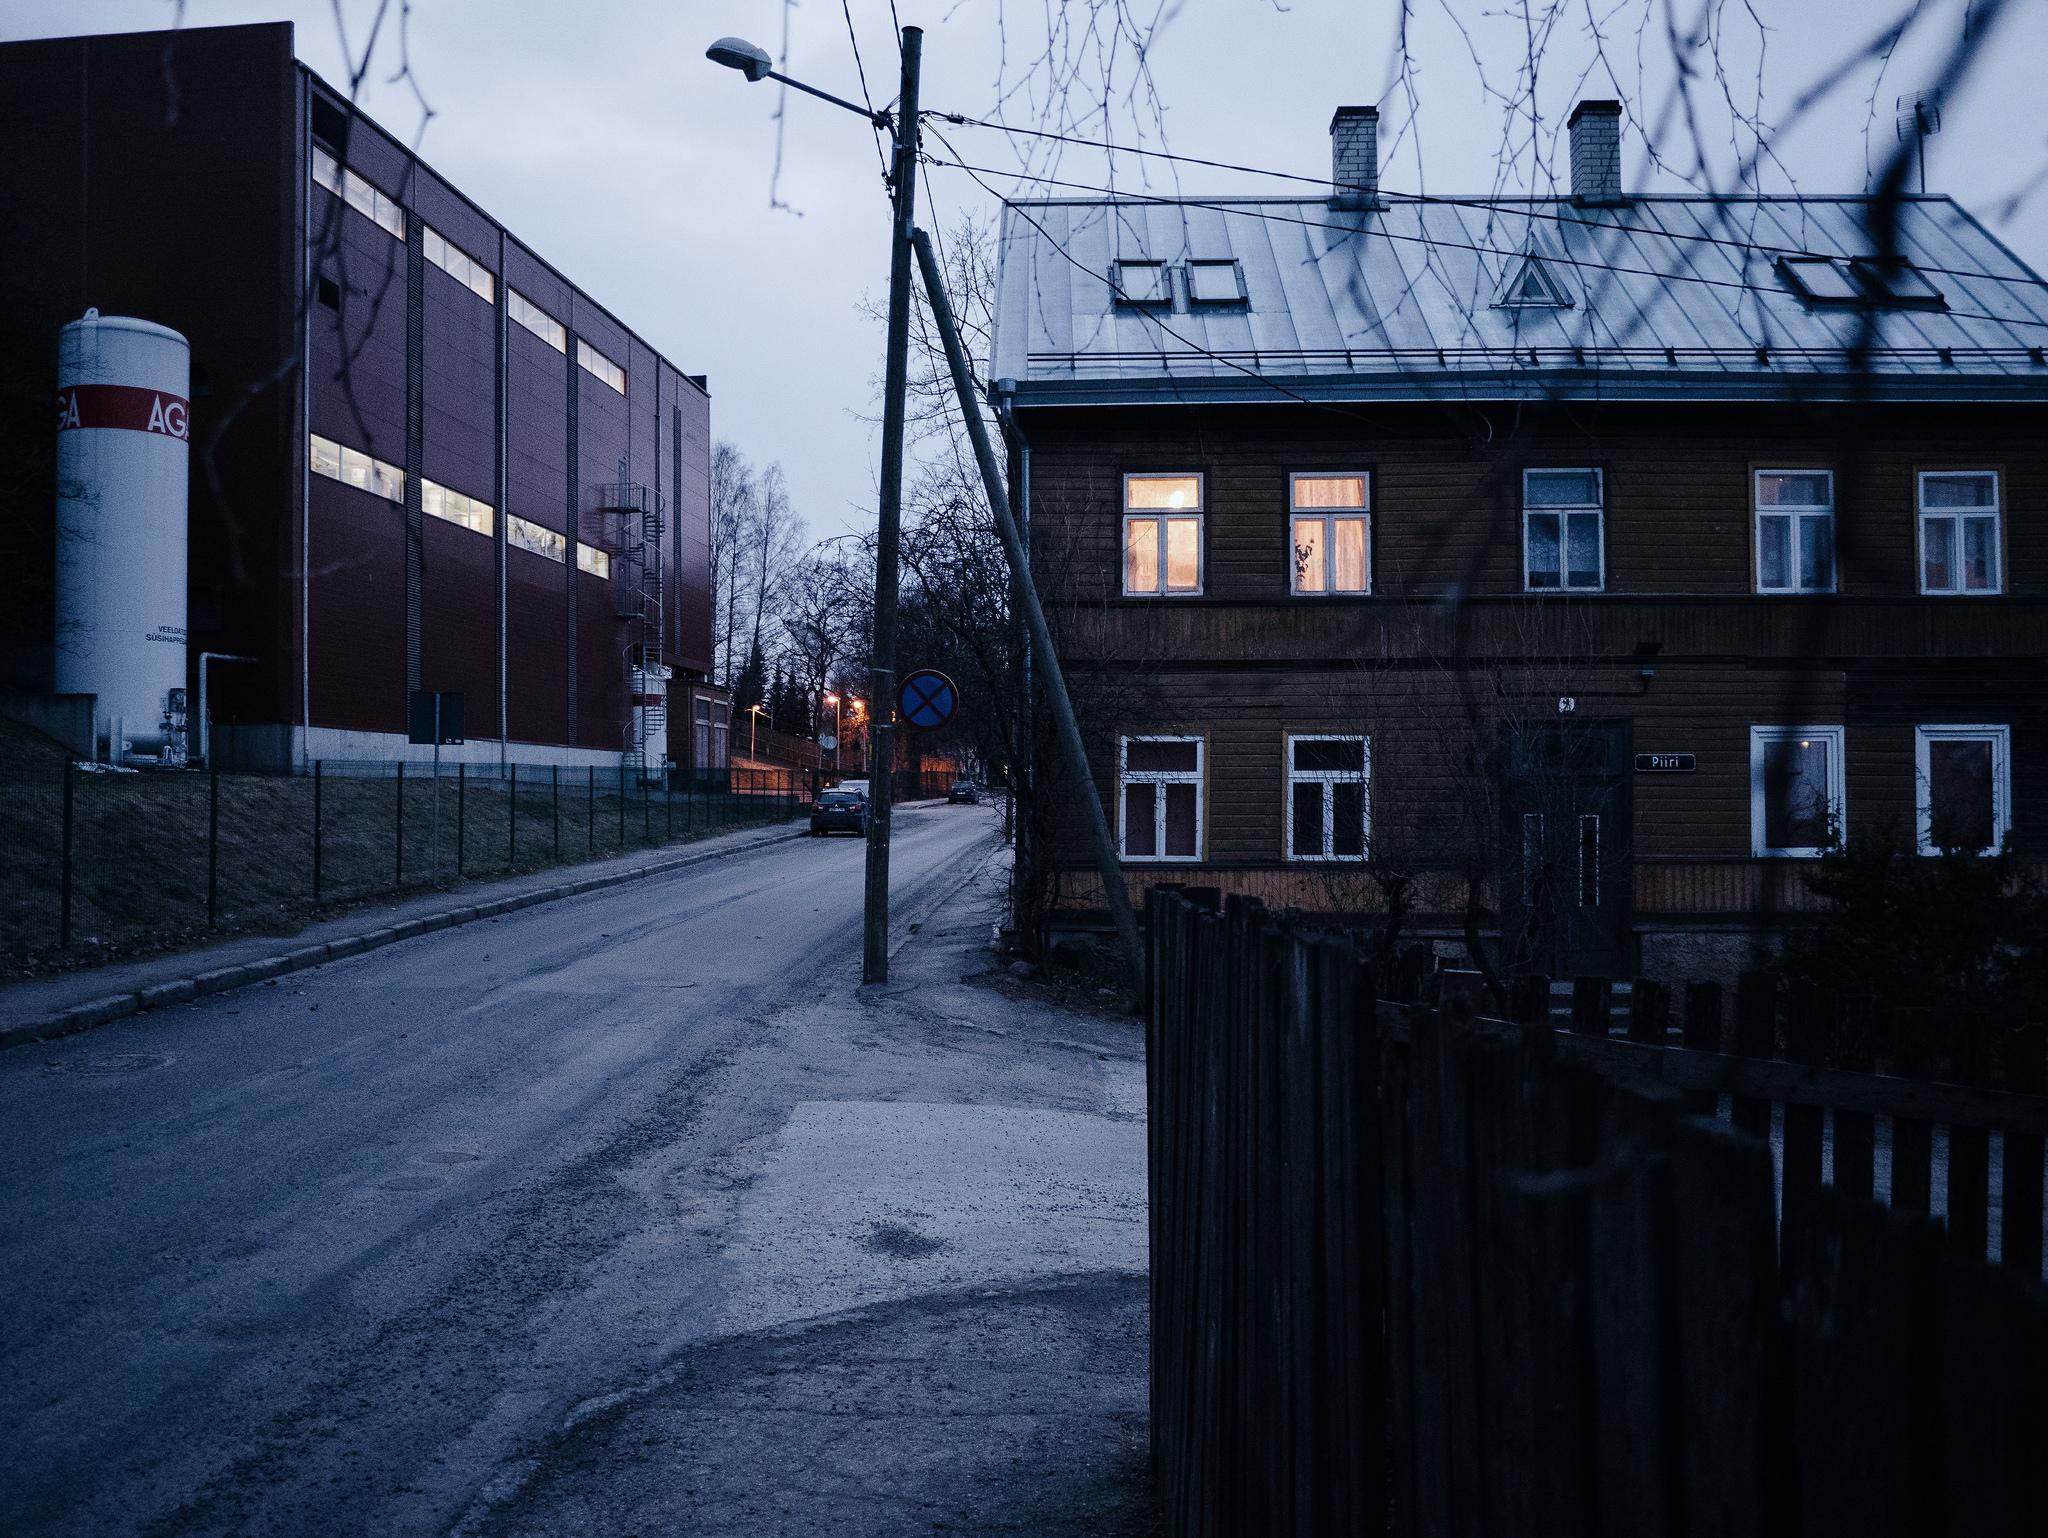 Supilinn, Tartu, Estonia. April 2015.